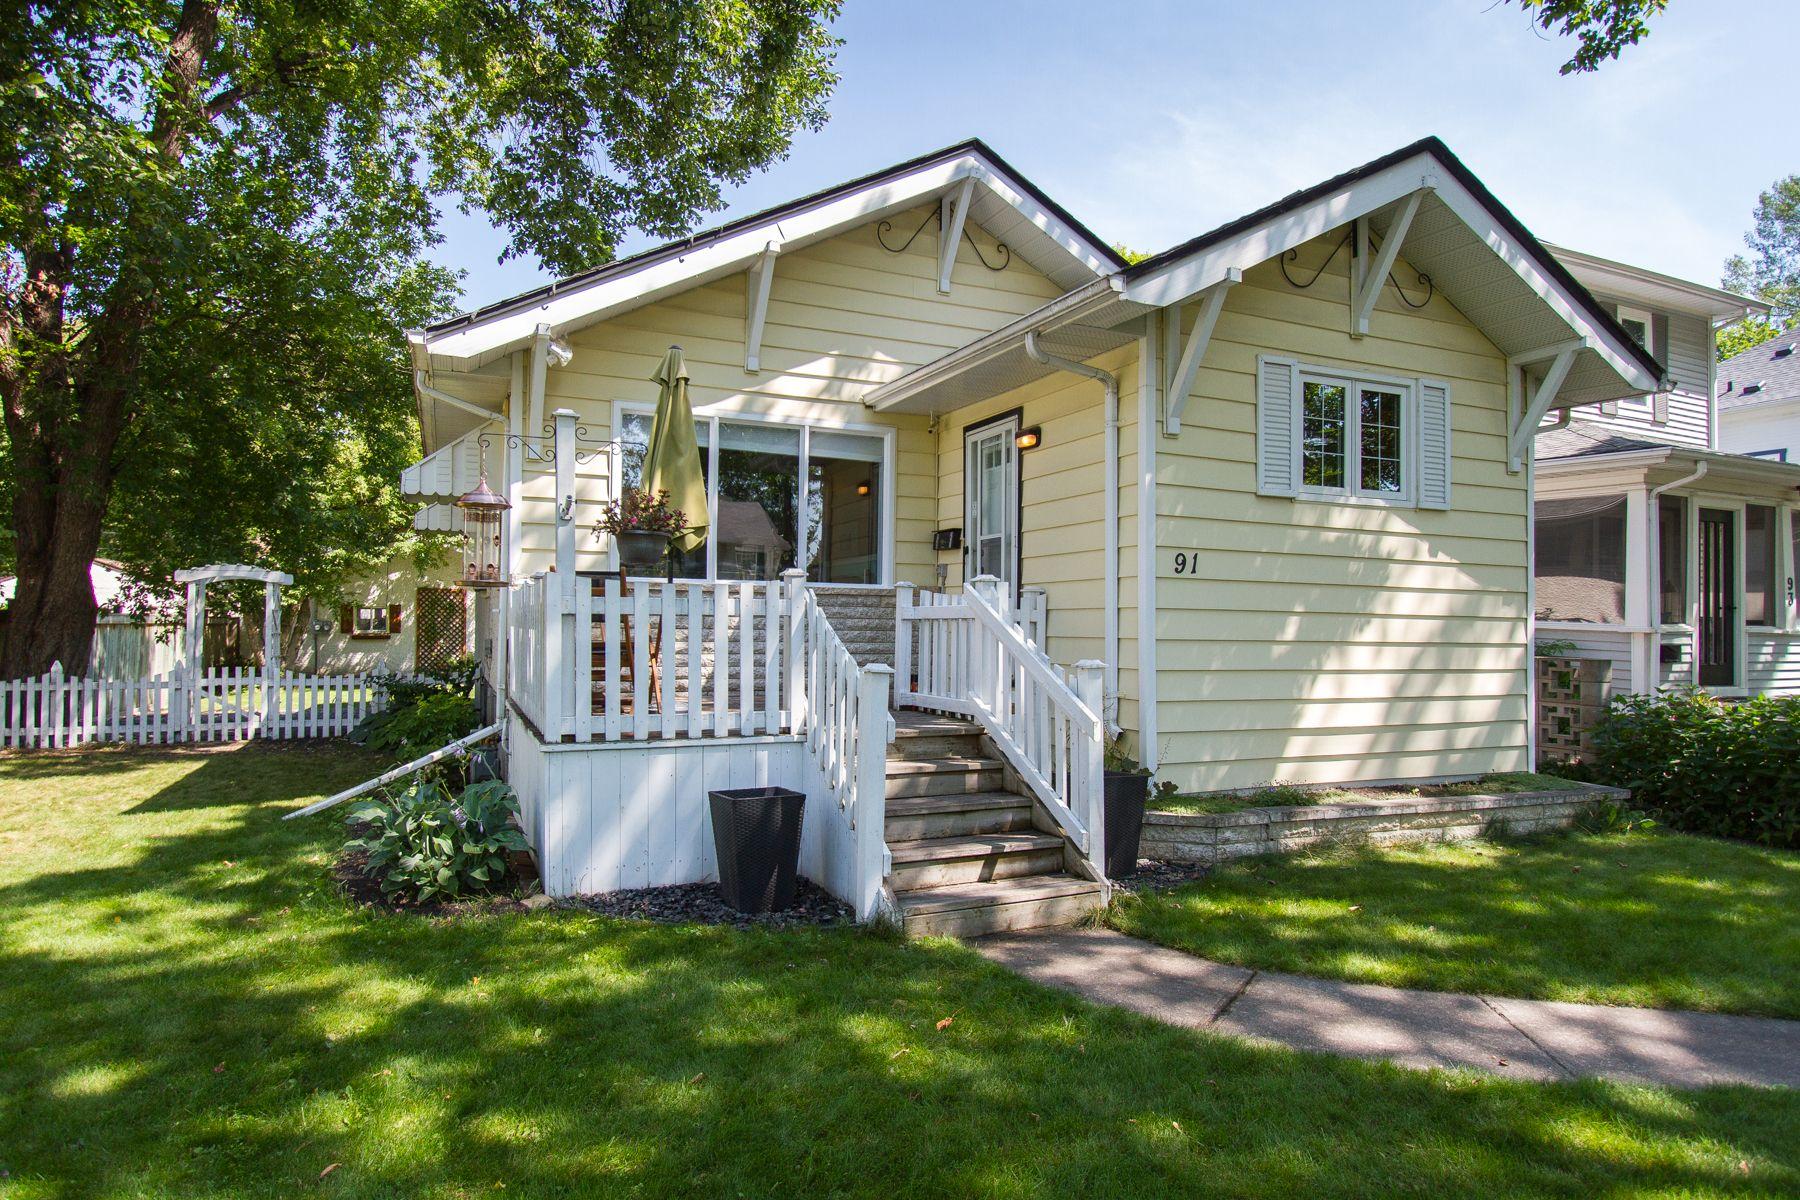 Main Photo: 91 Helmsdale Avenue in Winnipeg: Fraser's Grove House for sale (3C)  : MLS®# 1720444